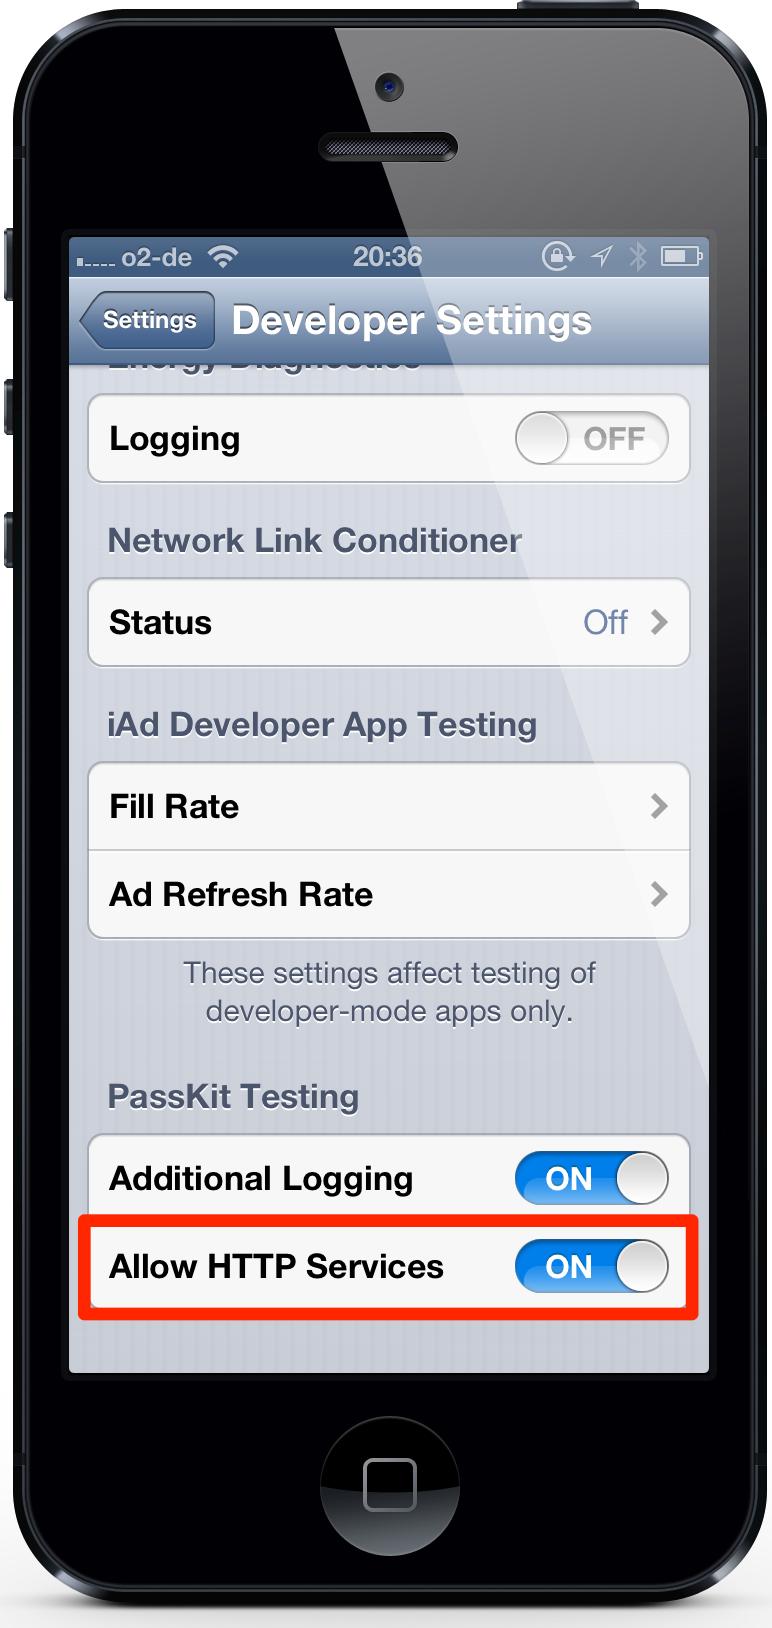 iOS Passbook Tutorial – Ole Begemann